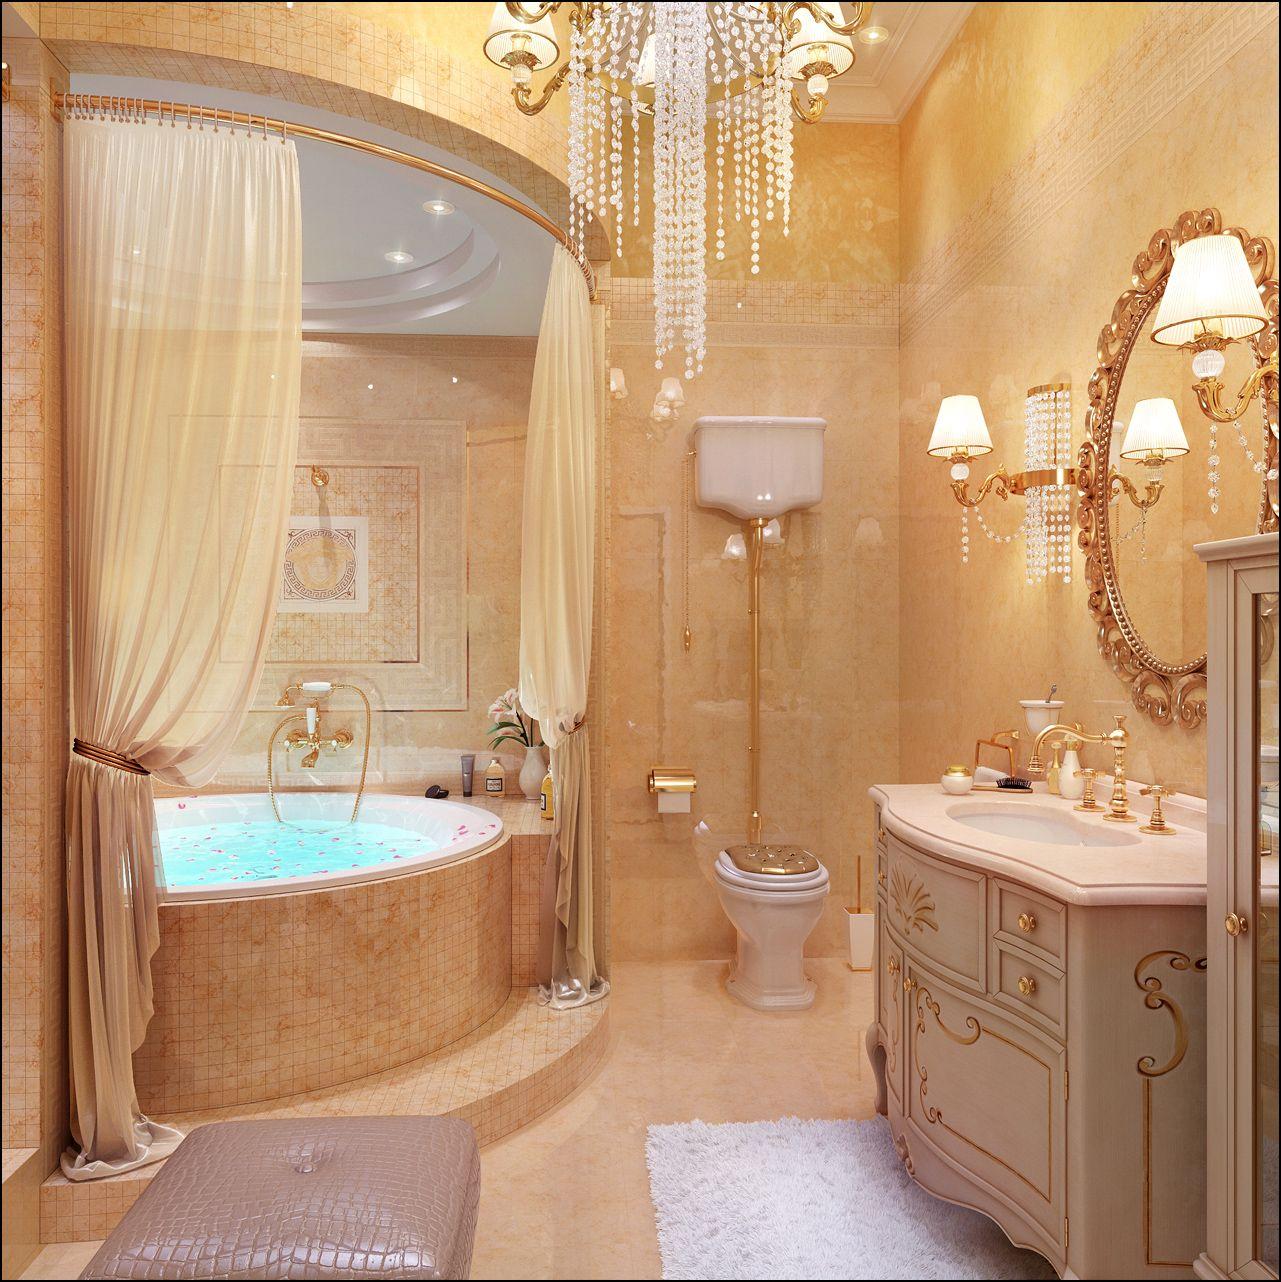 Bath With Jacuzi Bathroom Pinterest Bath Luxury And Interiors - Royal bath tubs